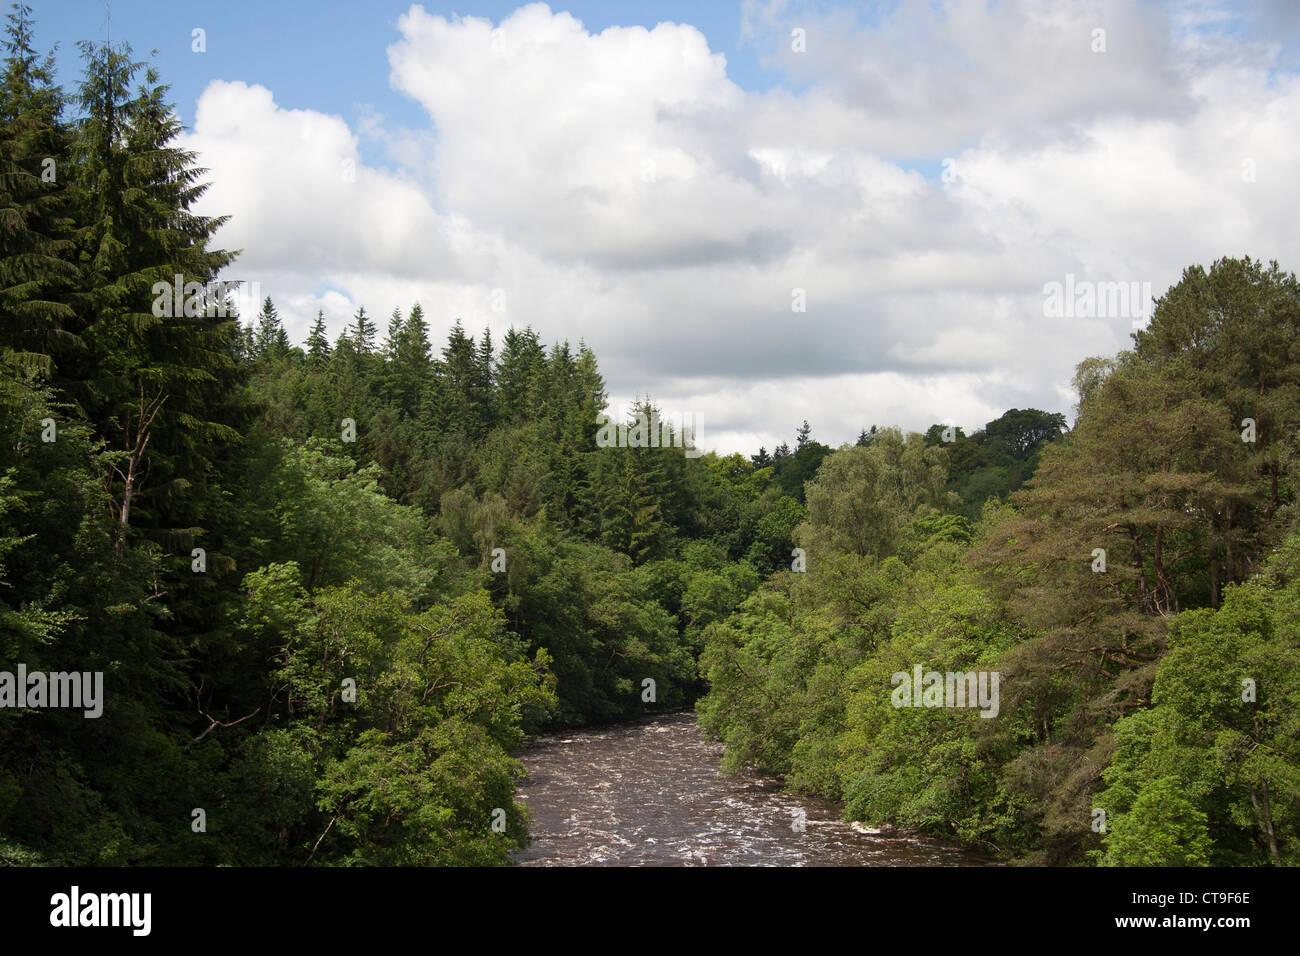 River Clyde at New Lanark  summer 2012 - Stock Image